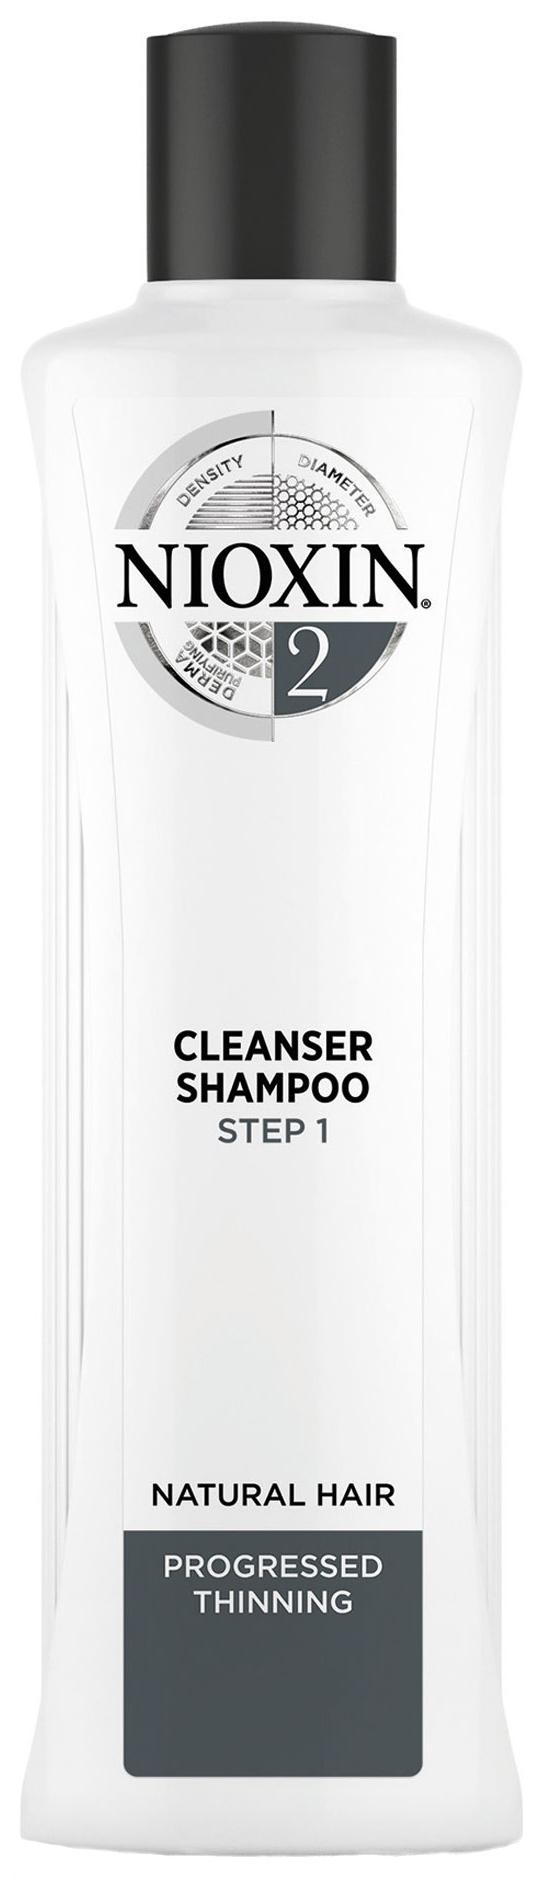 Купить Шампунь Nioxin System 2 Cleanser Shampoo 1000 мл, Cleanser Shampoo Система 2